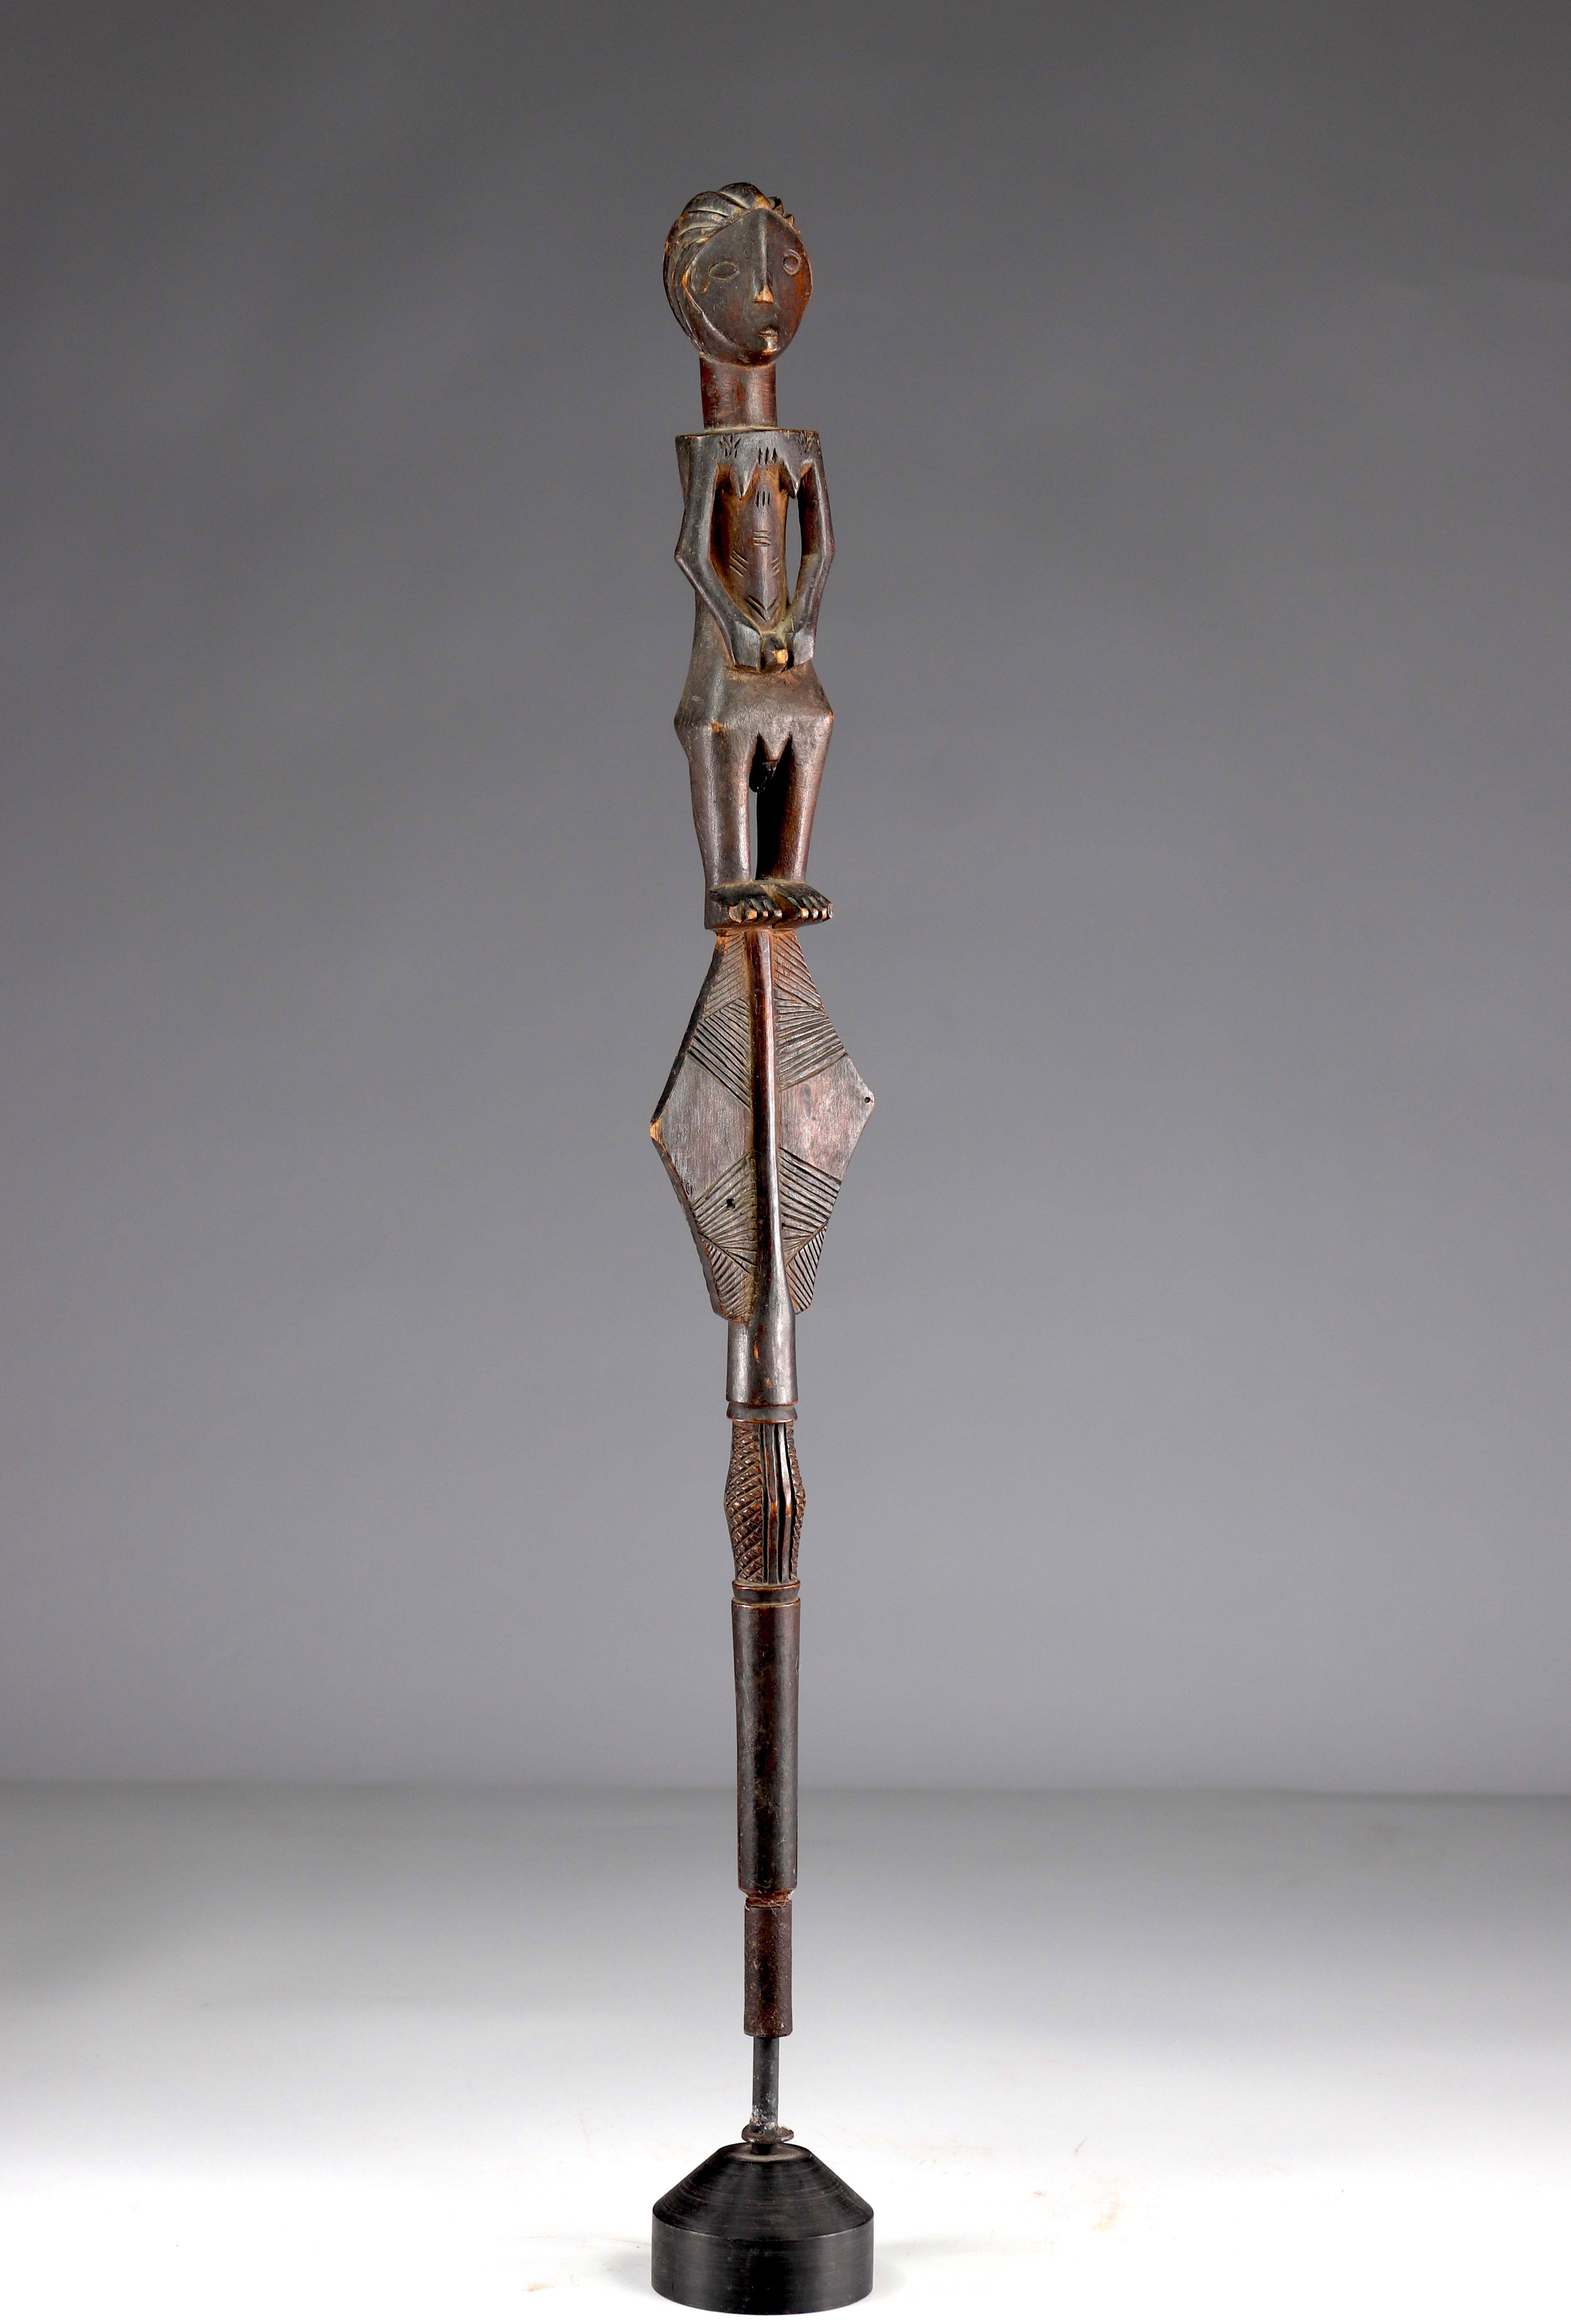 Beautiful and elegant Luba scepter top - beautiful original patina - private collection Belgium - Image 2 of 5